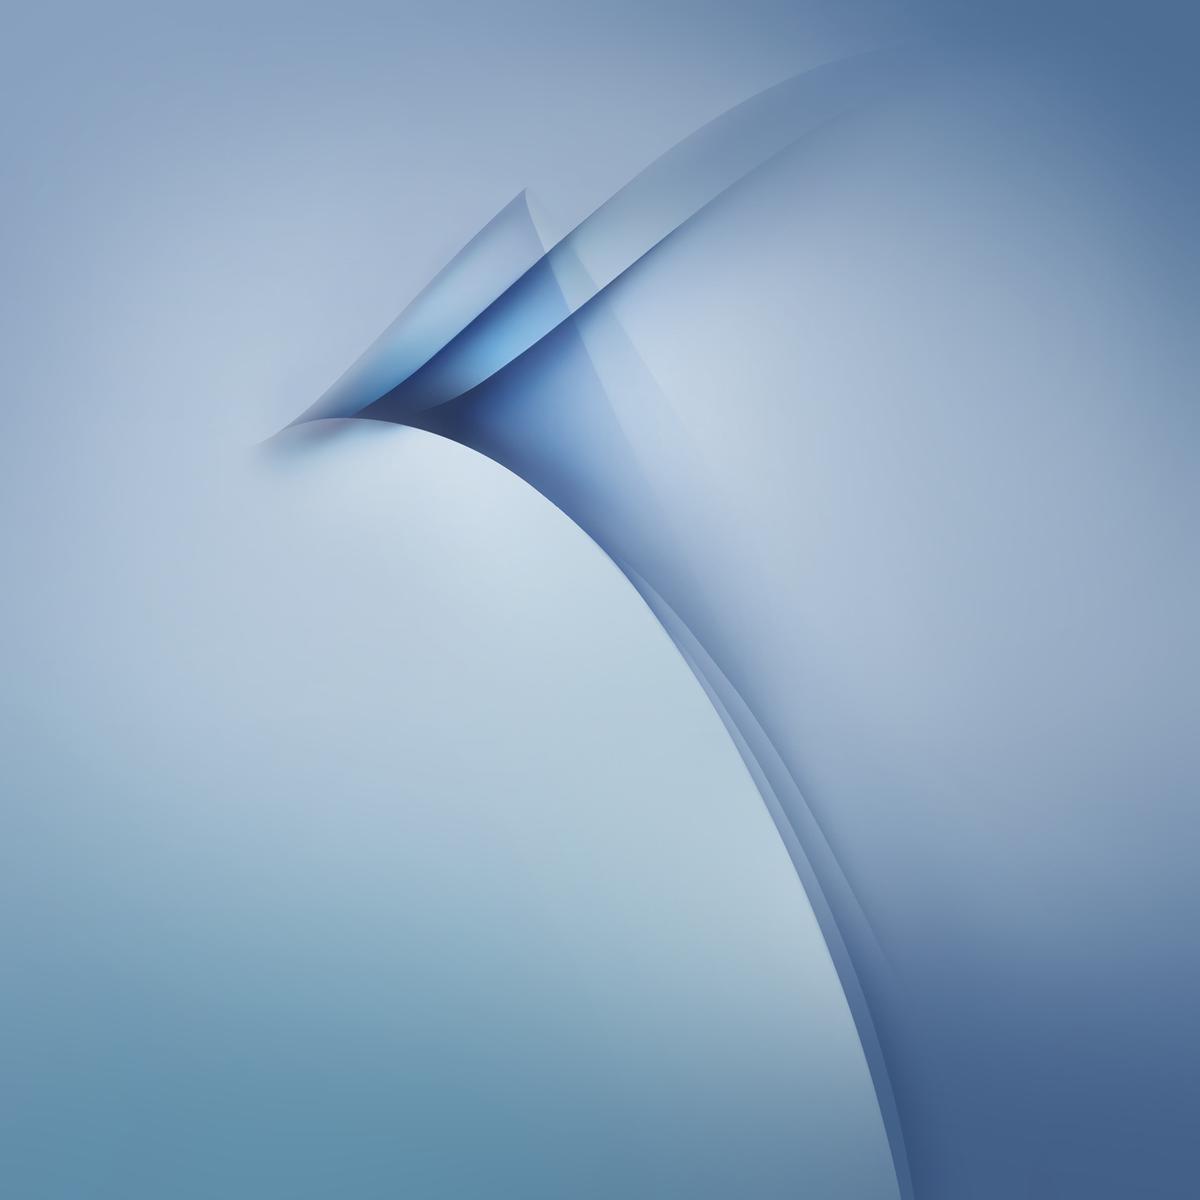 Galaxy-S7-wallpaper-3